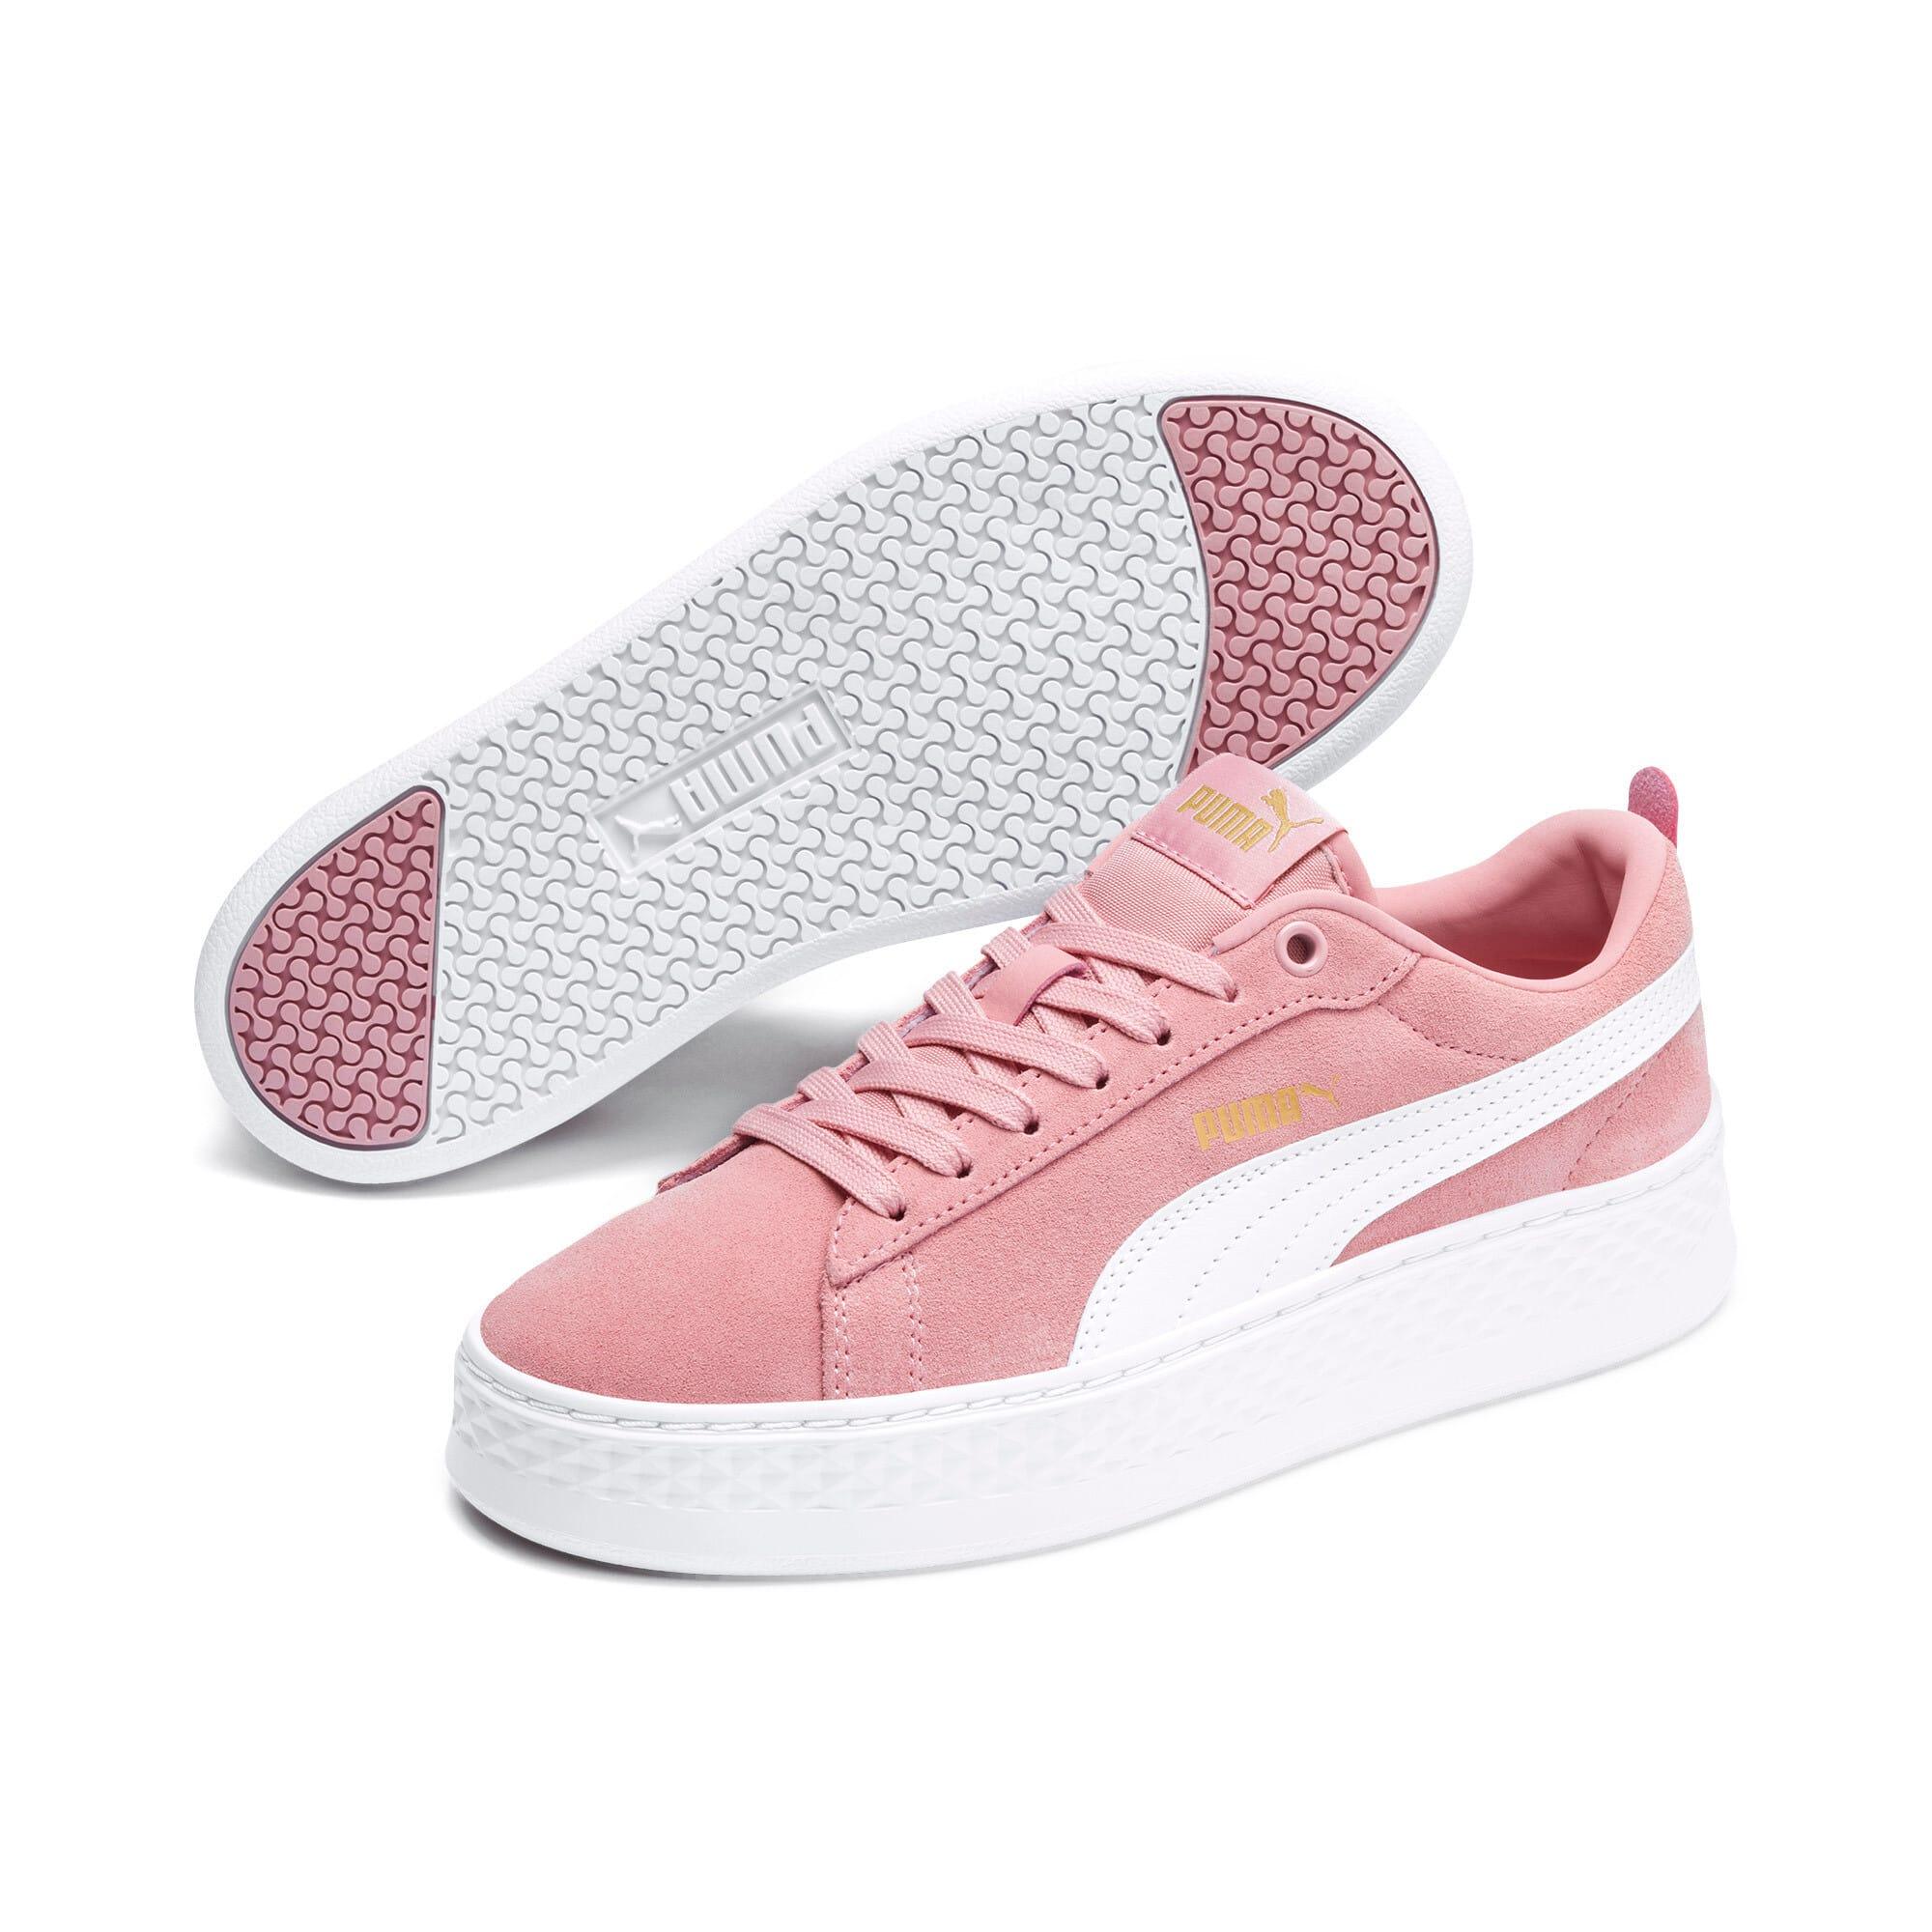 Thumbnail 3 of PUMA Smash Platform Suede Women's Sneakers, Bridal Rose-Puma White-Gold, medium